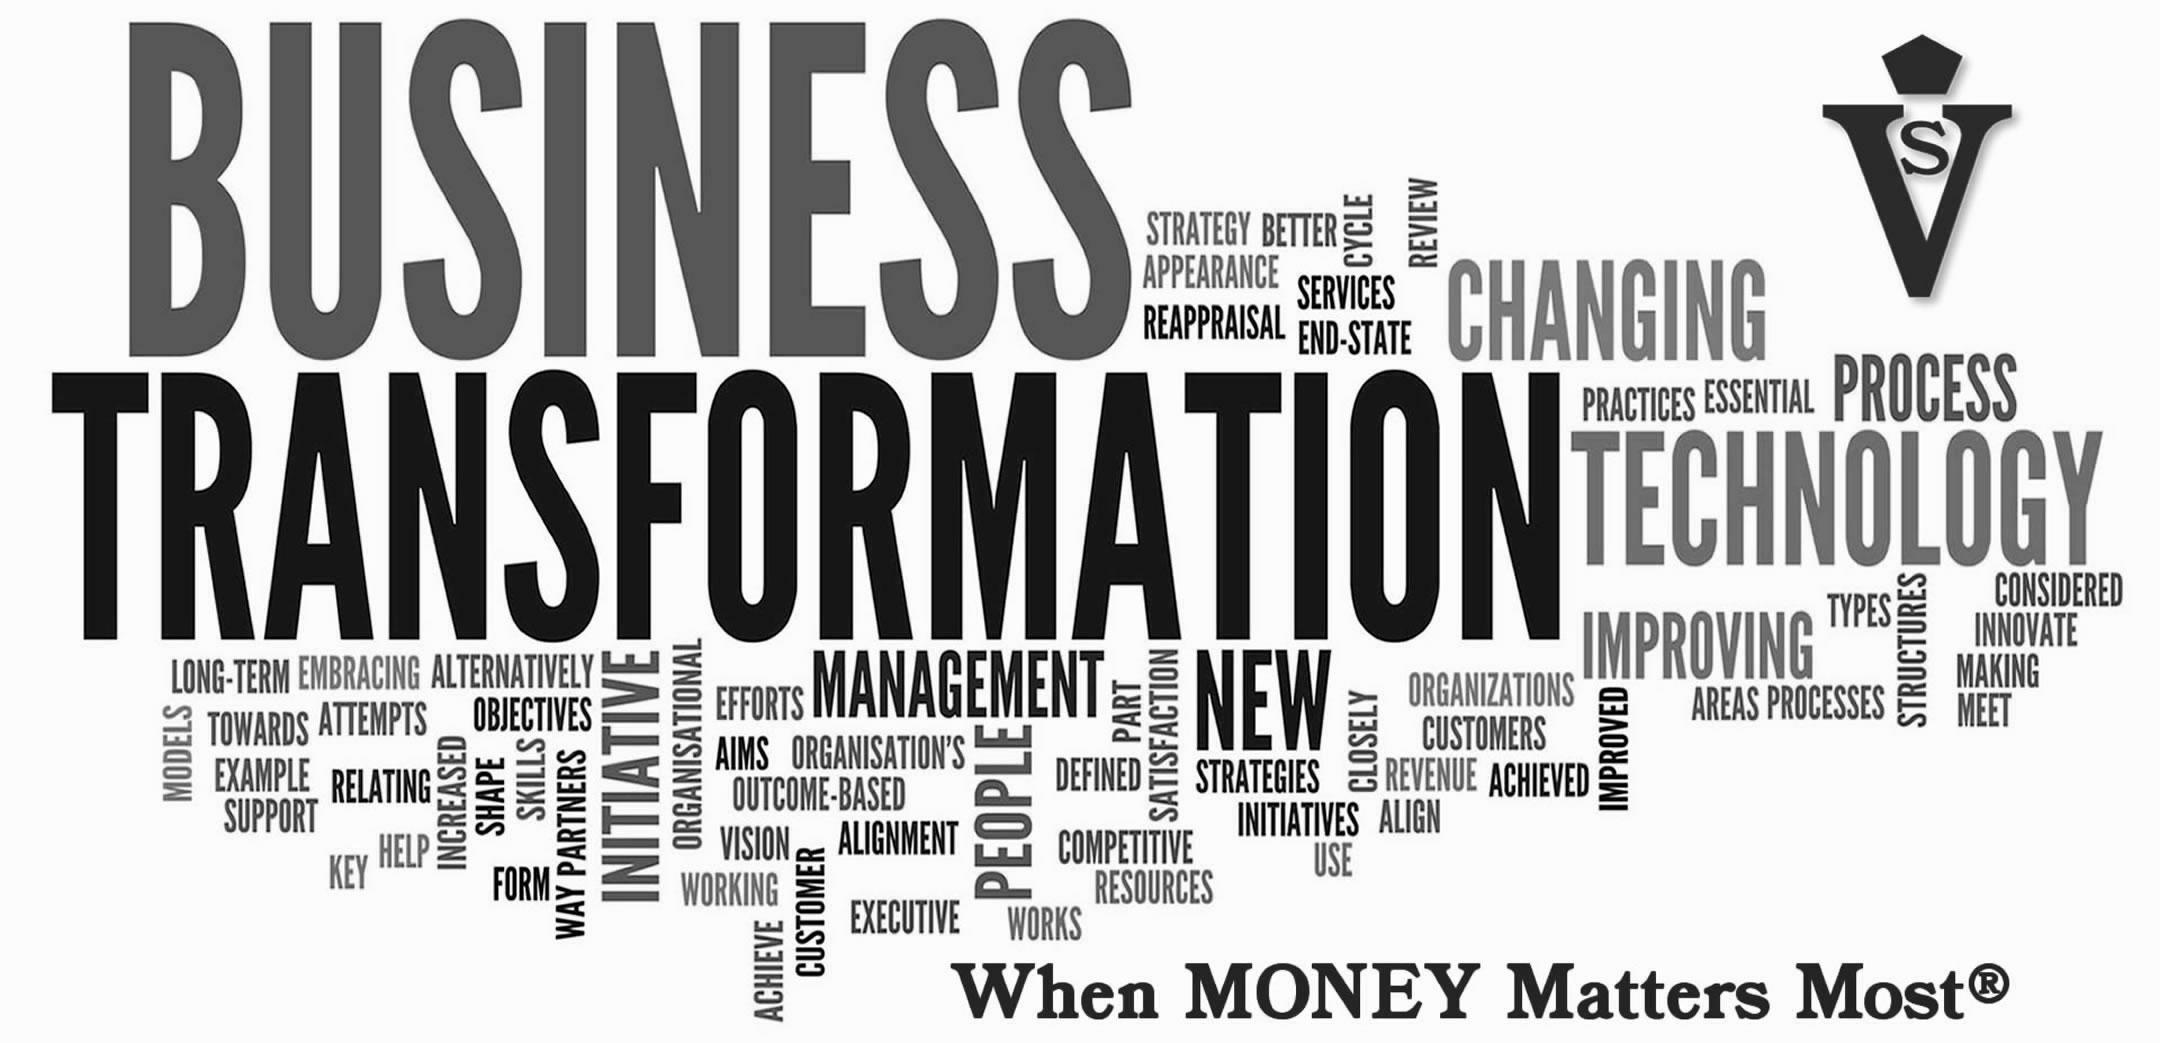 CEO business transformation seminar training strategy workshop